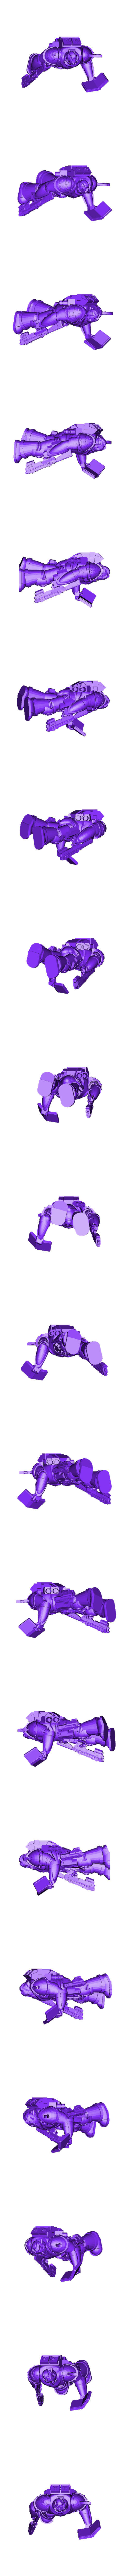 Space_Priest.stl Download free STL file Space Priest • 3D print object, mrhers2